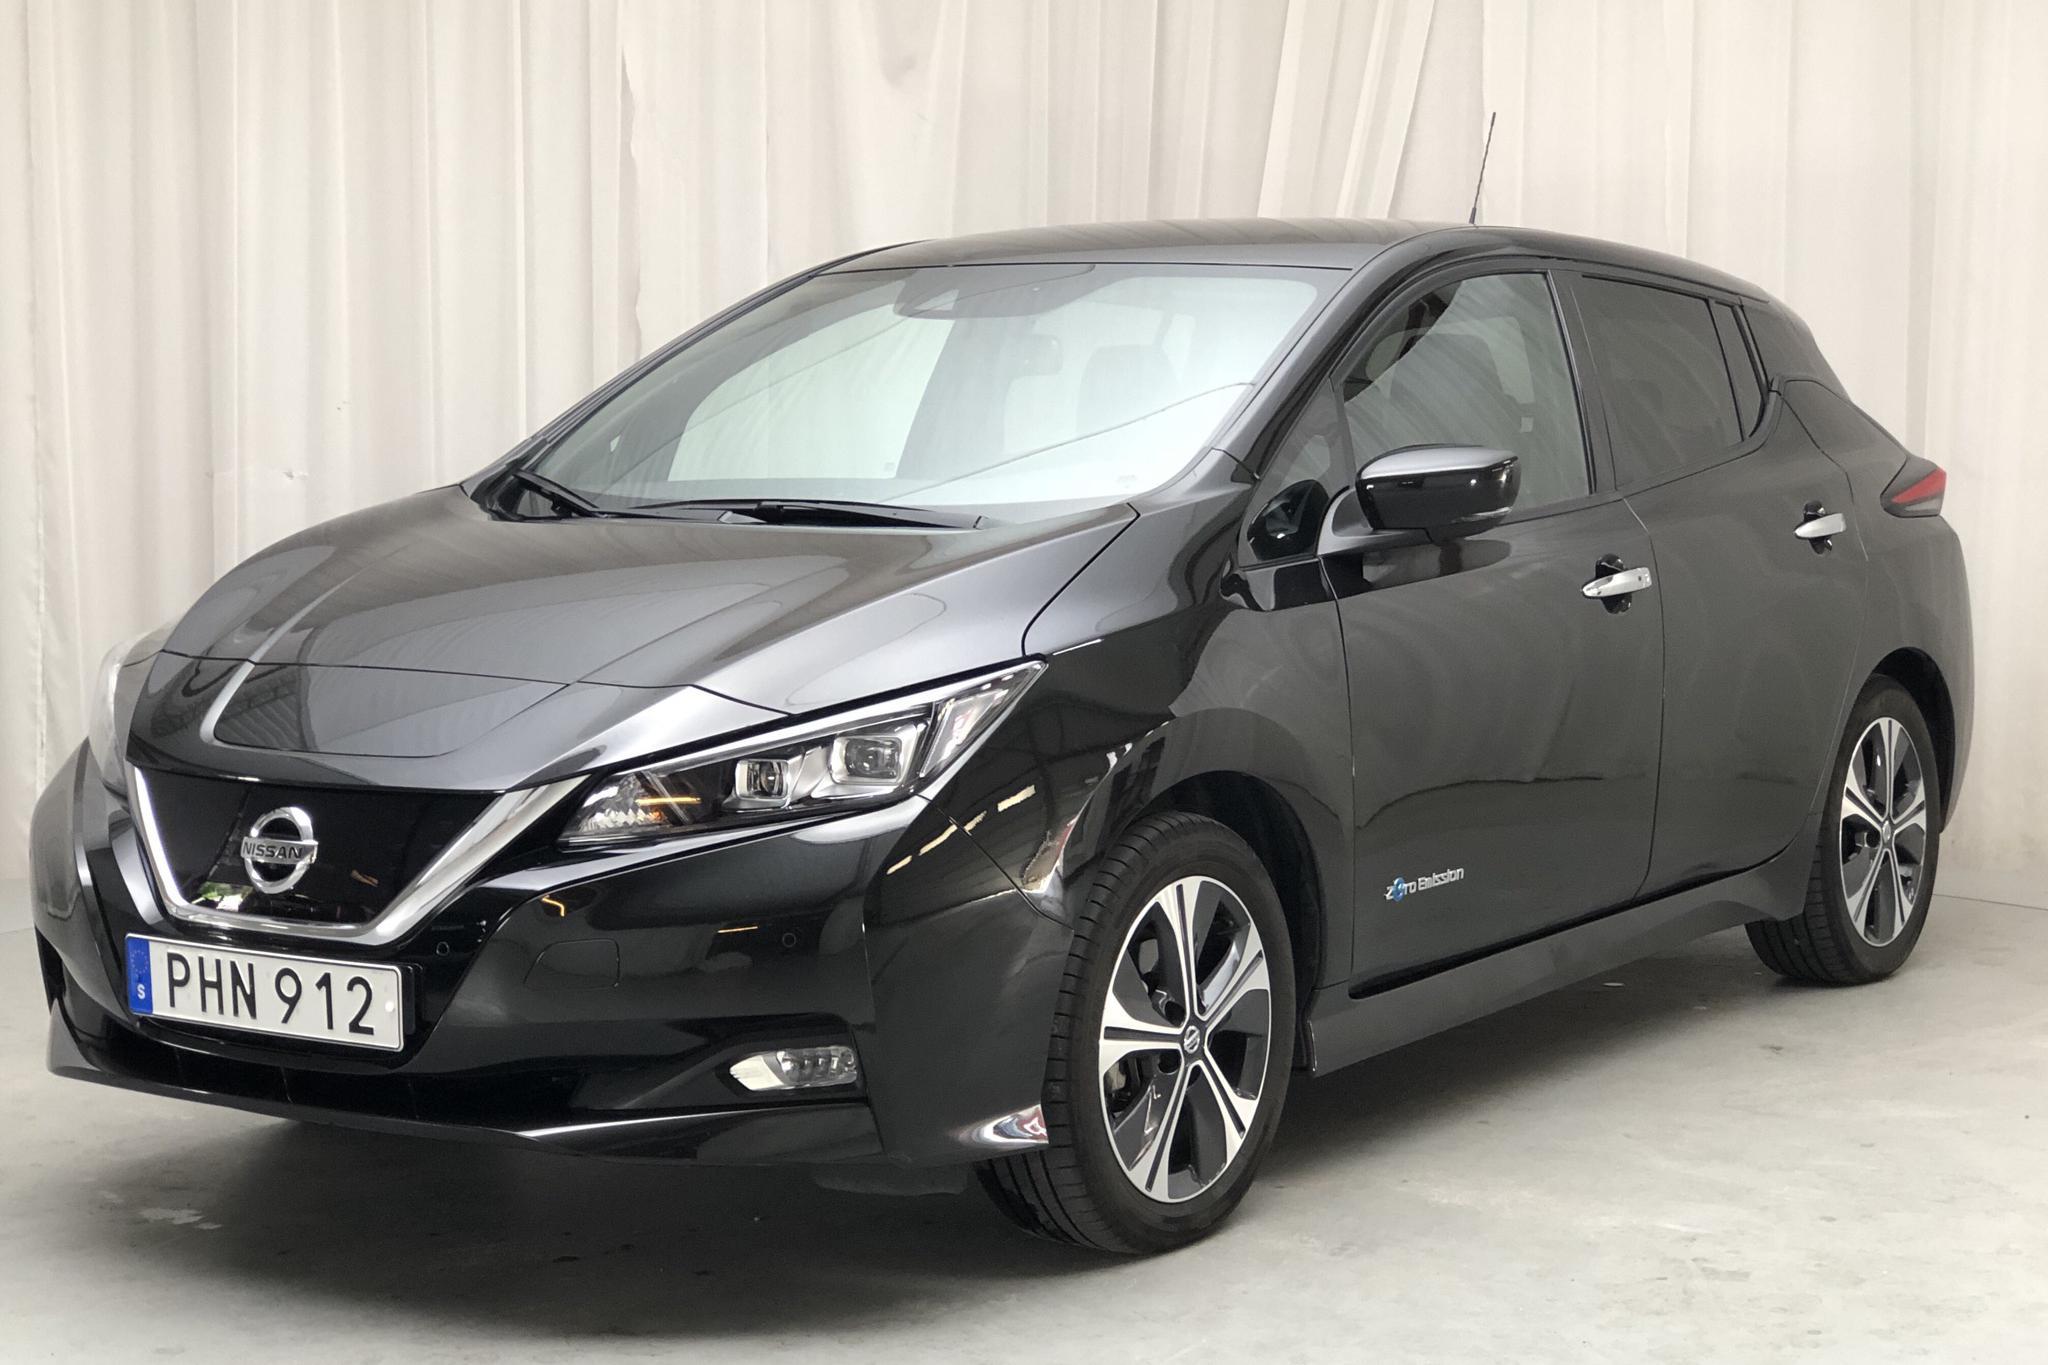 Nissan LEAF 5dr 40 kWh (150hk) - 18 800 km - Automatic - black - 2019